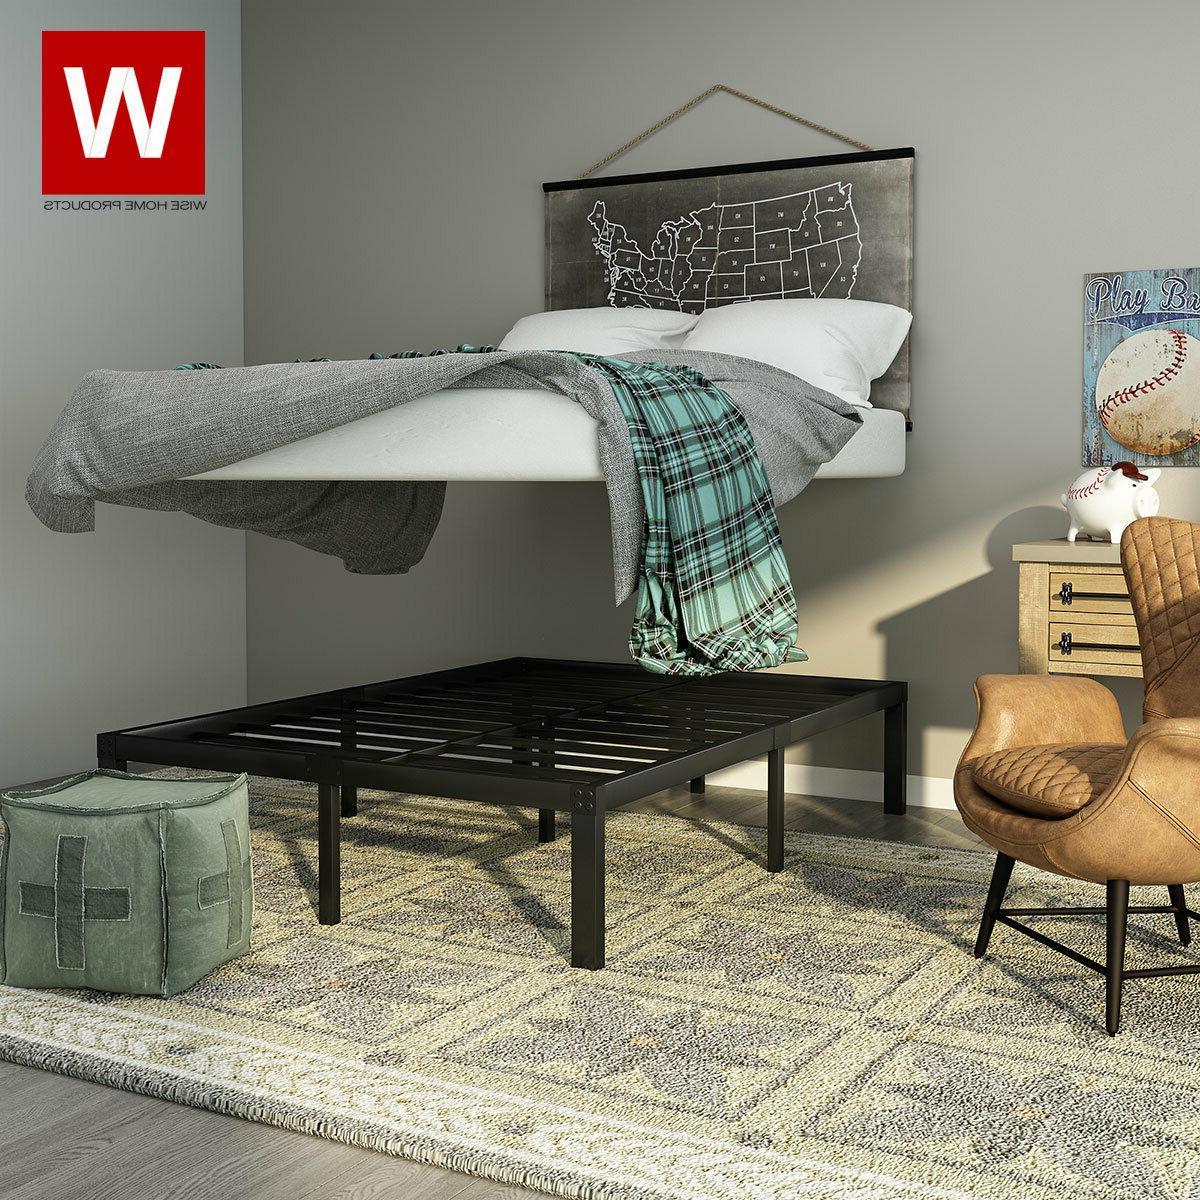 Full Size Steel Bed Frame - Heavy Duty Metal Platform Beds -